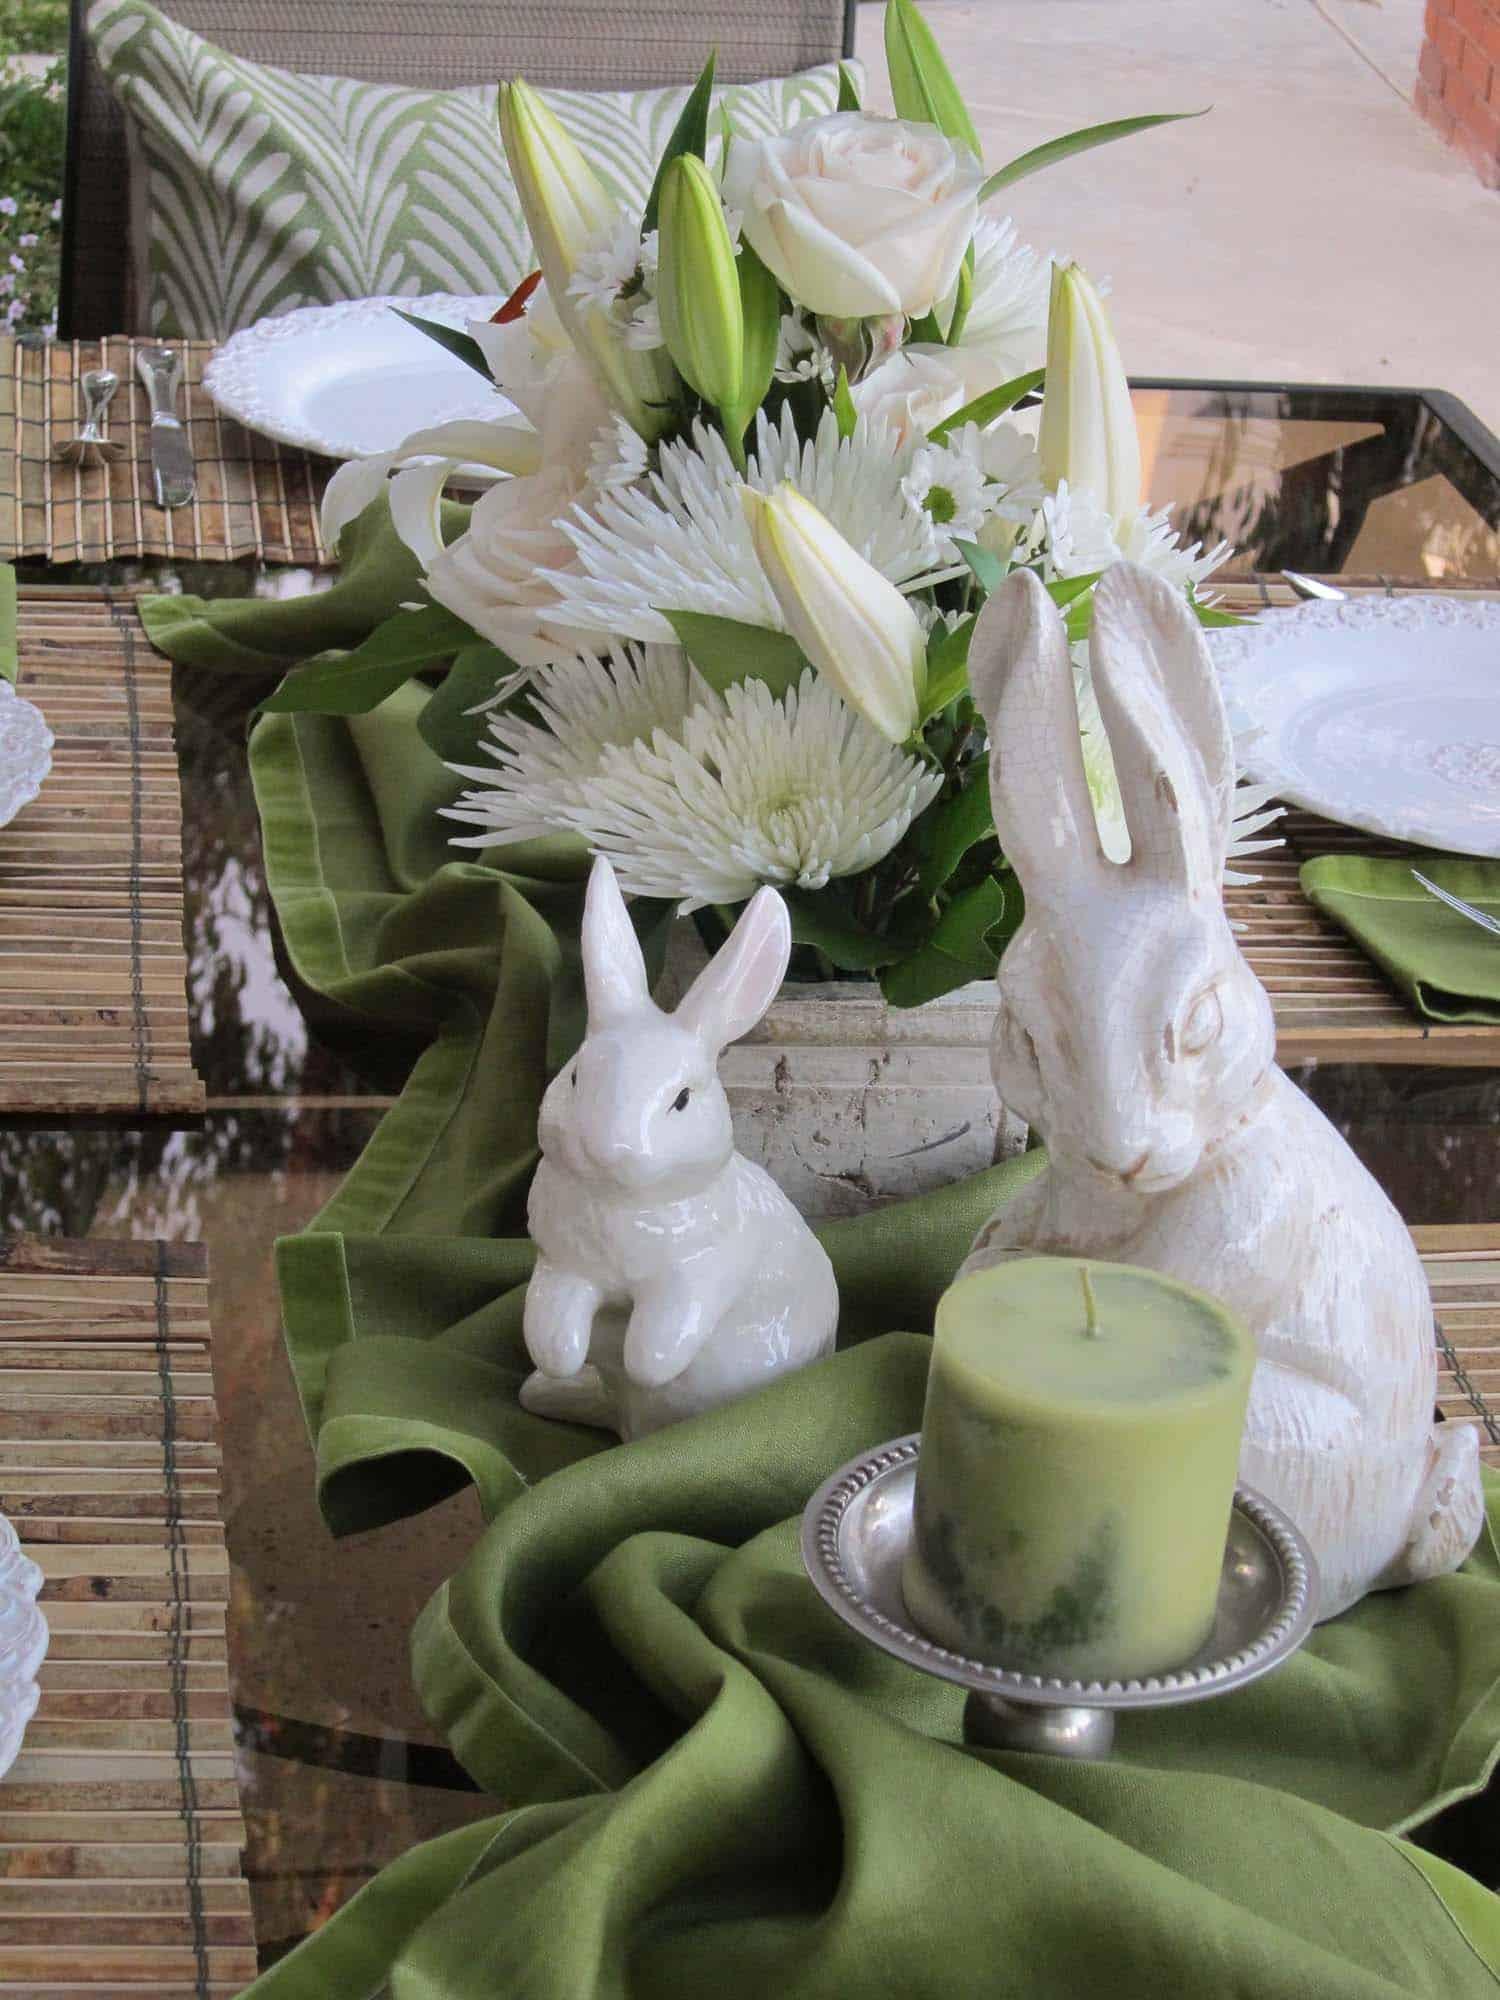 Inspiring Easter Table Centerpiece Ideas-23-1 Kindesign